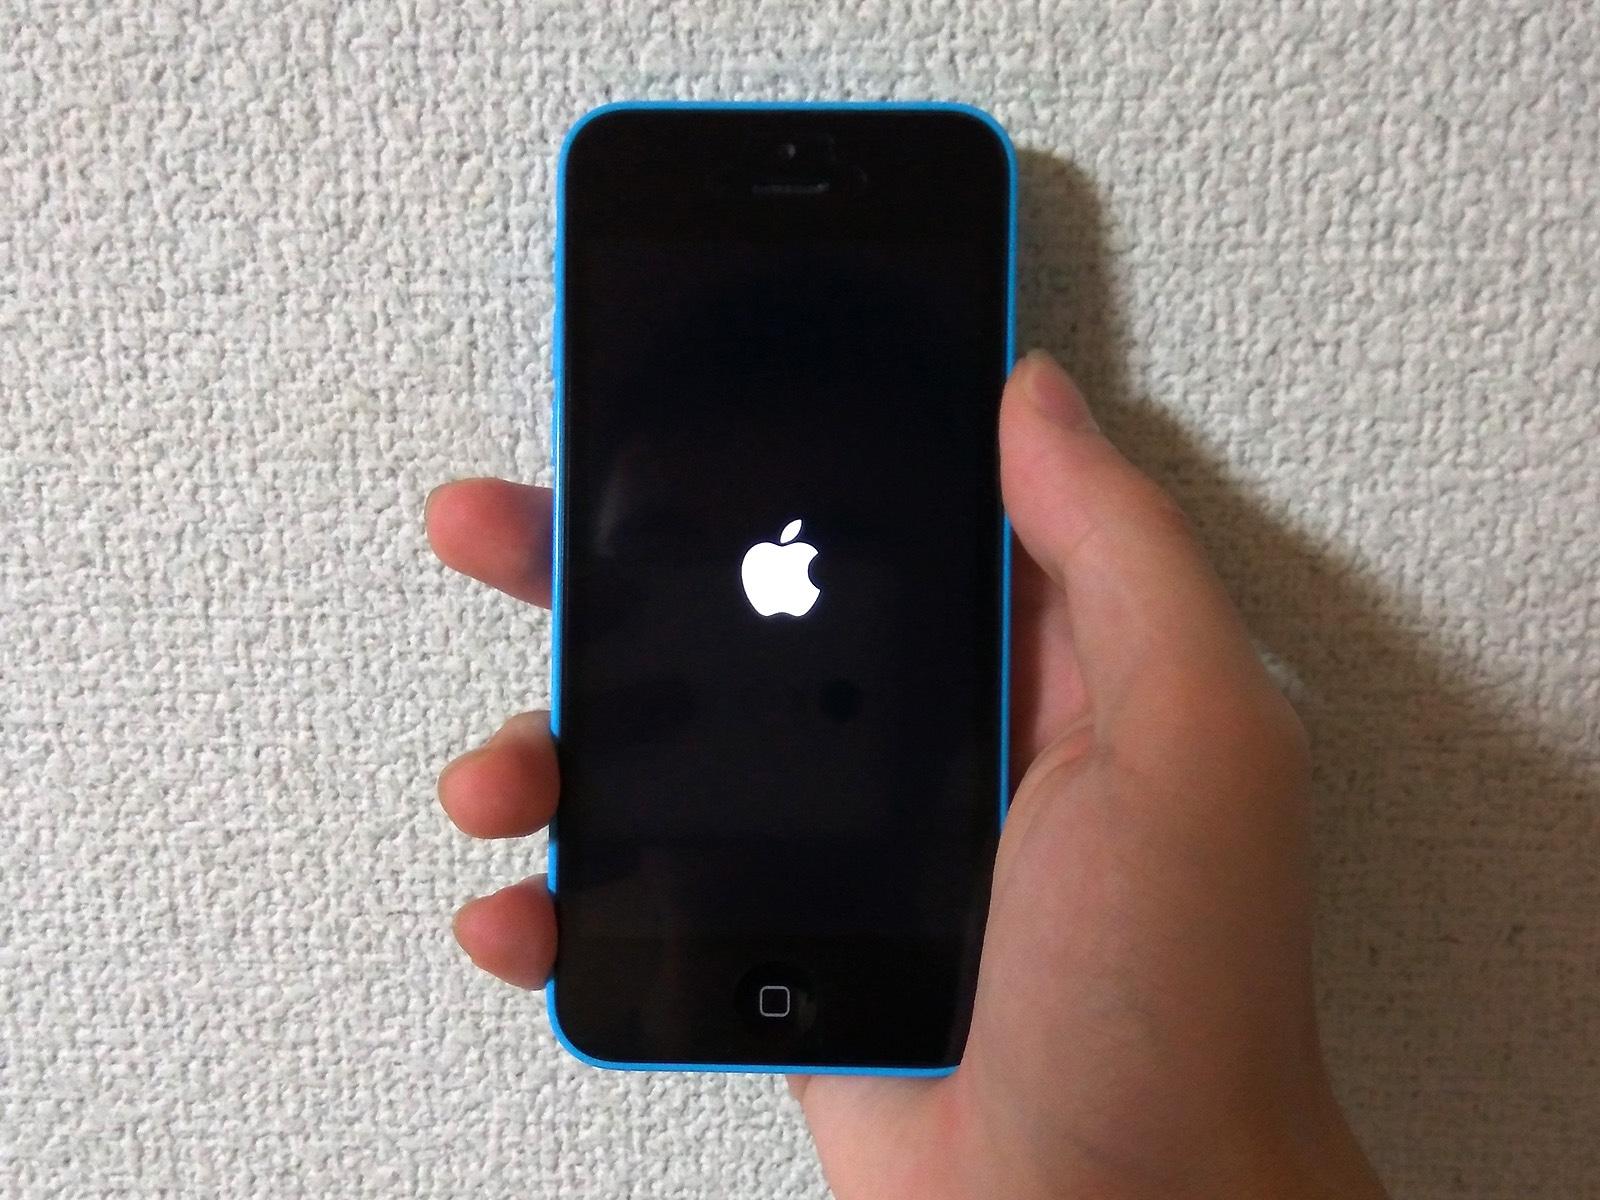 iPhone 5c バッテリー交換 起動確認